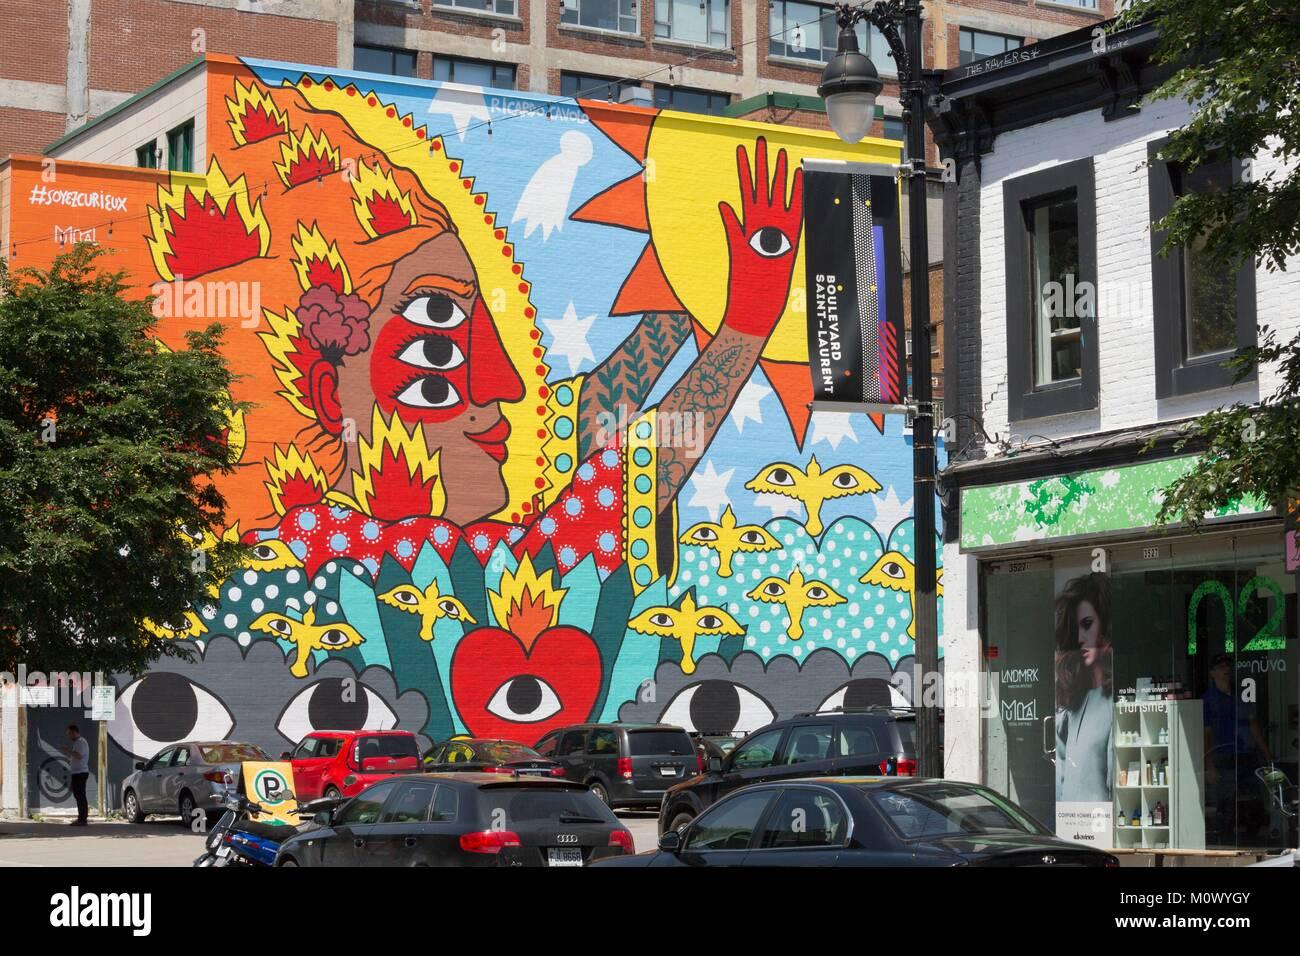 Canada,Quebec province,Montreal,Plateau-Mont-Royal,Boulevard Saint-Laurent,mural Be Curious by Ricardo Cavolo (2017) - Stock Image